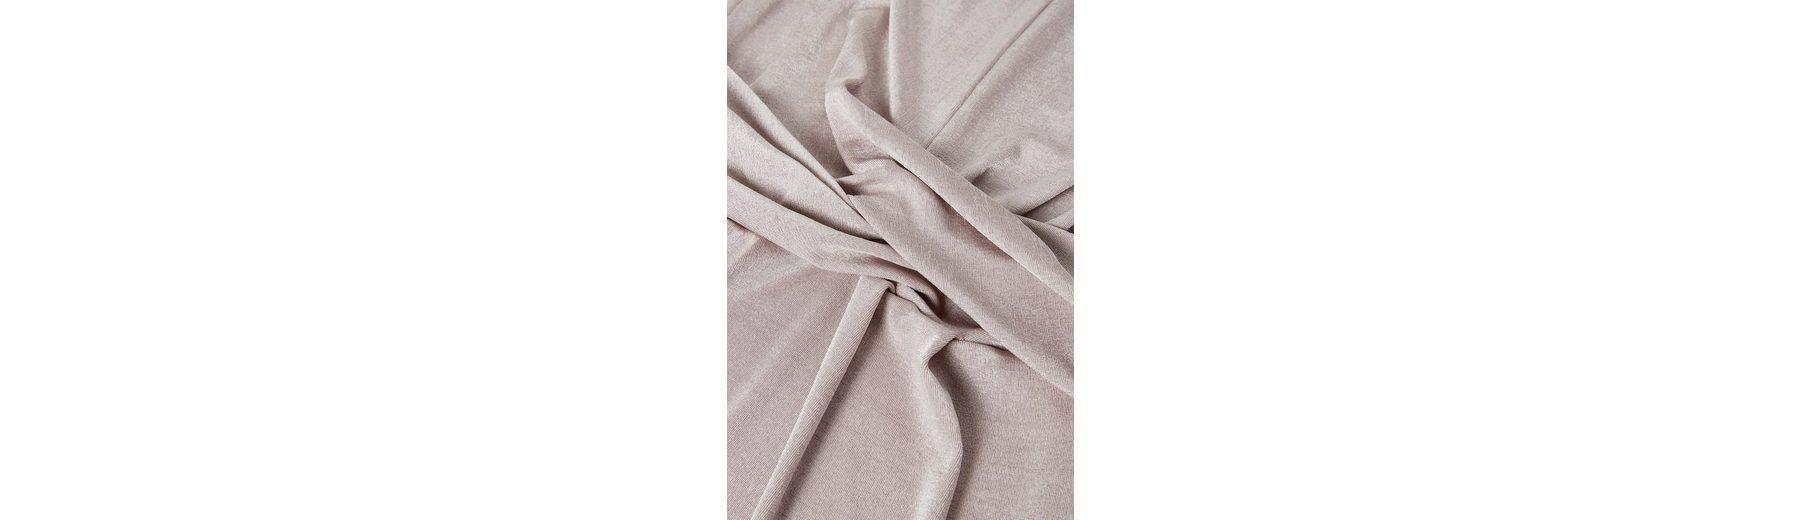 Next Drapiertes Kleid in Metallic Auslass qWNOoiC